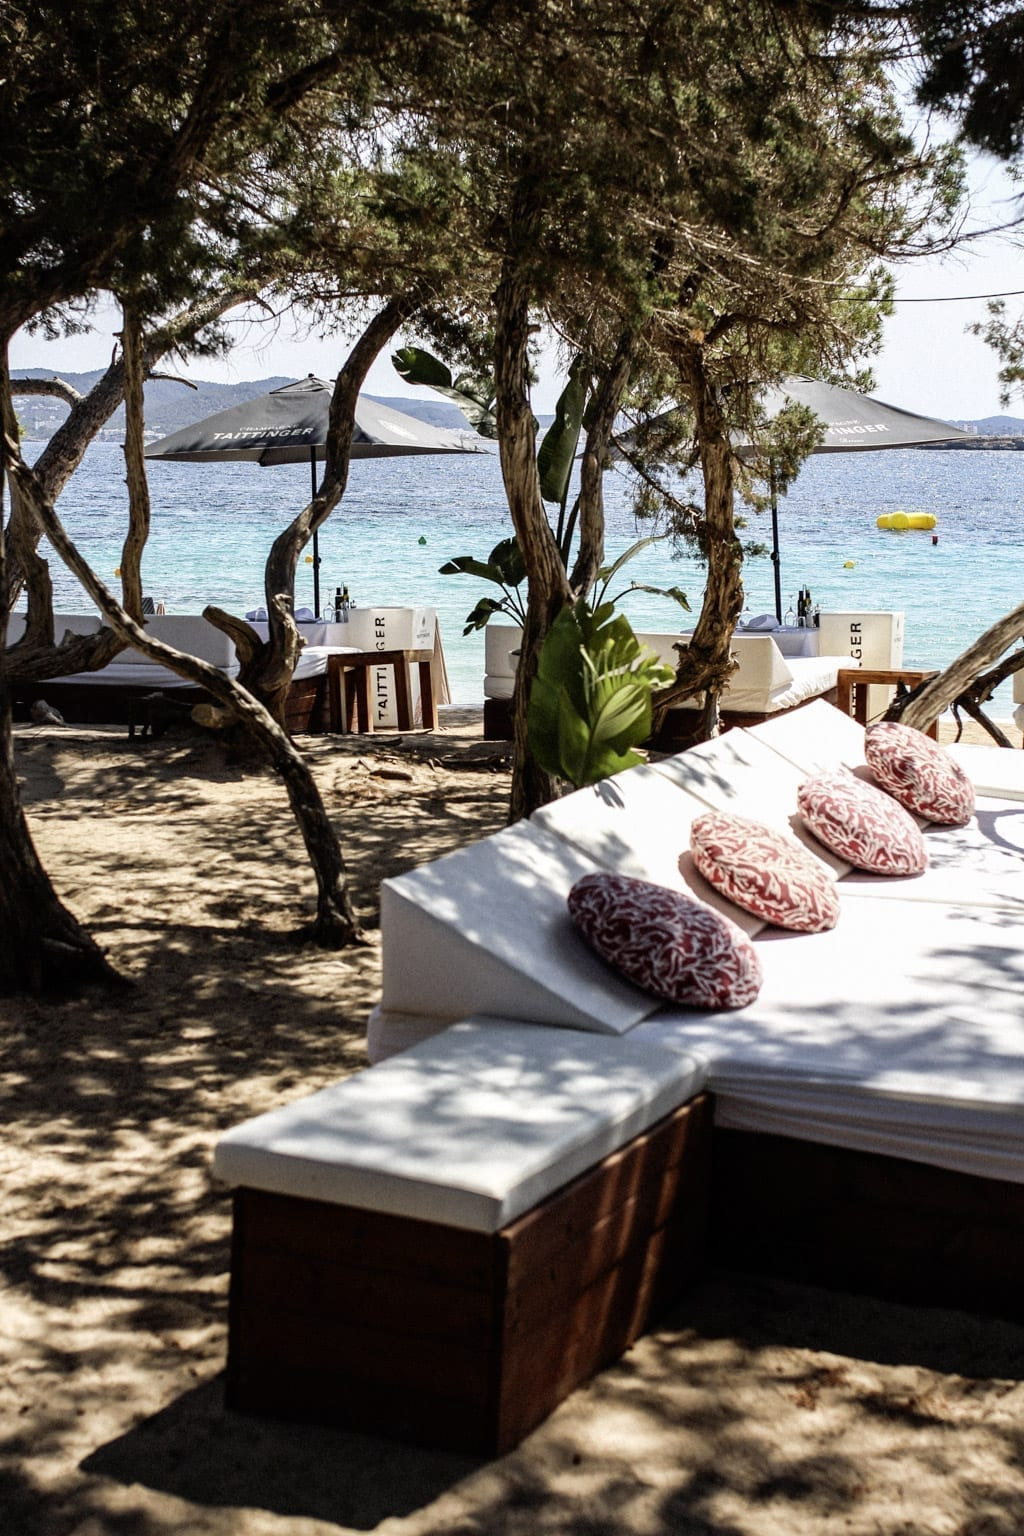 CK1605_Constantly-Cala-Bassa-Beach-Club-Ibiza-Spain-7867